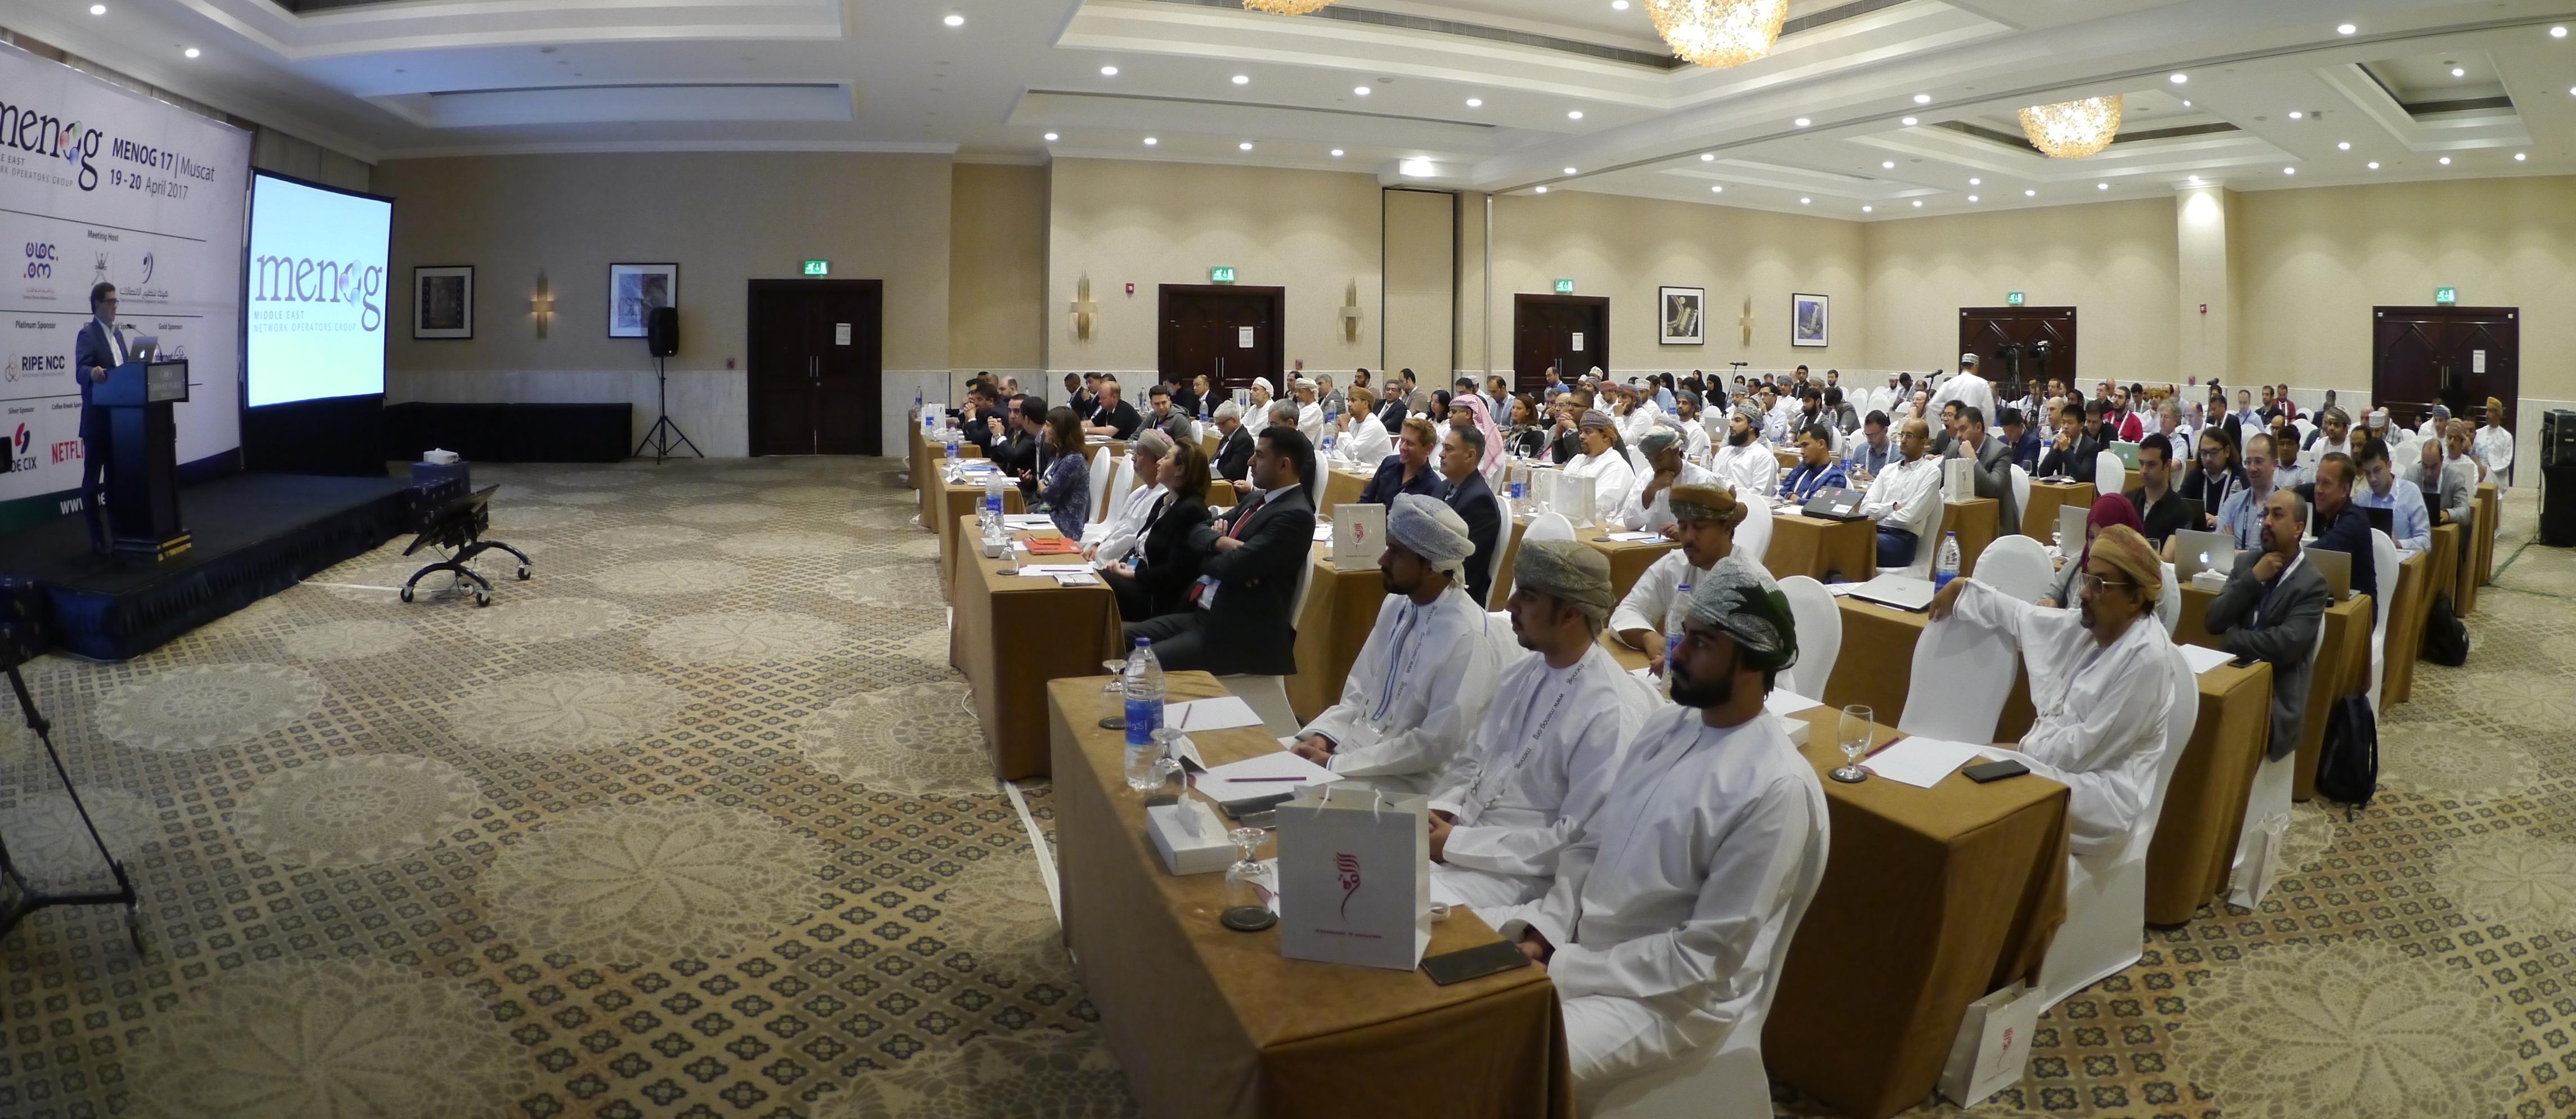 Internet Society Middle East Regional Bureau Participates in MENOG 17